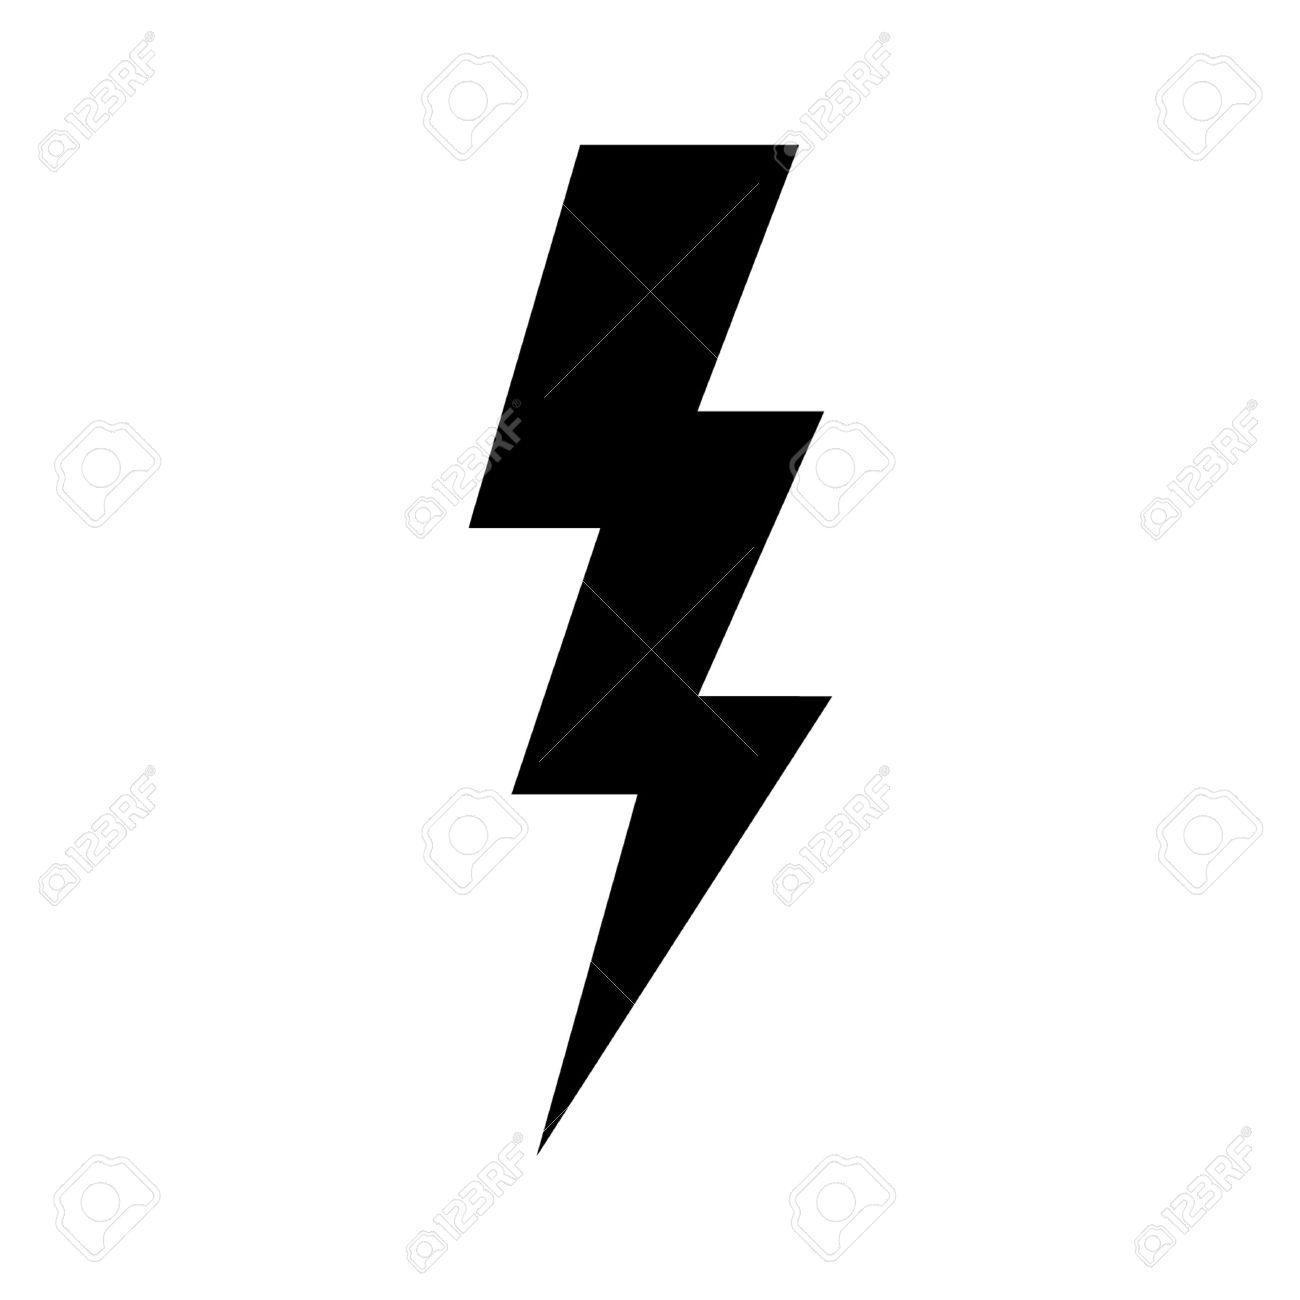 1300x1300 Lightning Bolt Silhouette Lightning Bolt Clipart, Explore Pictures